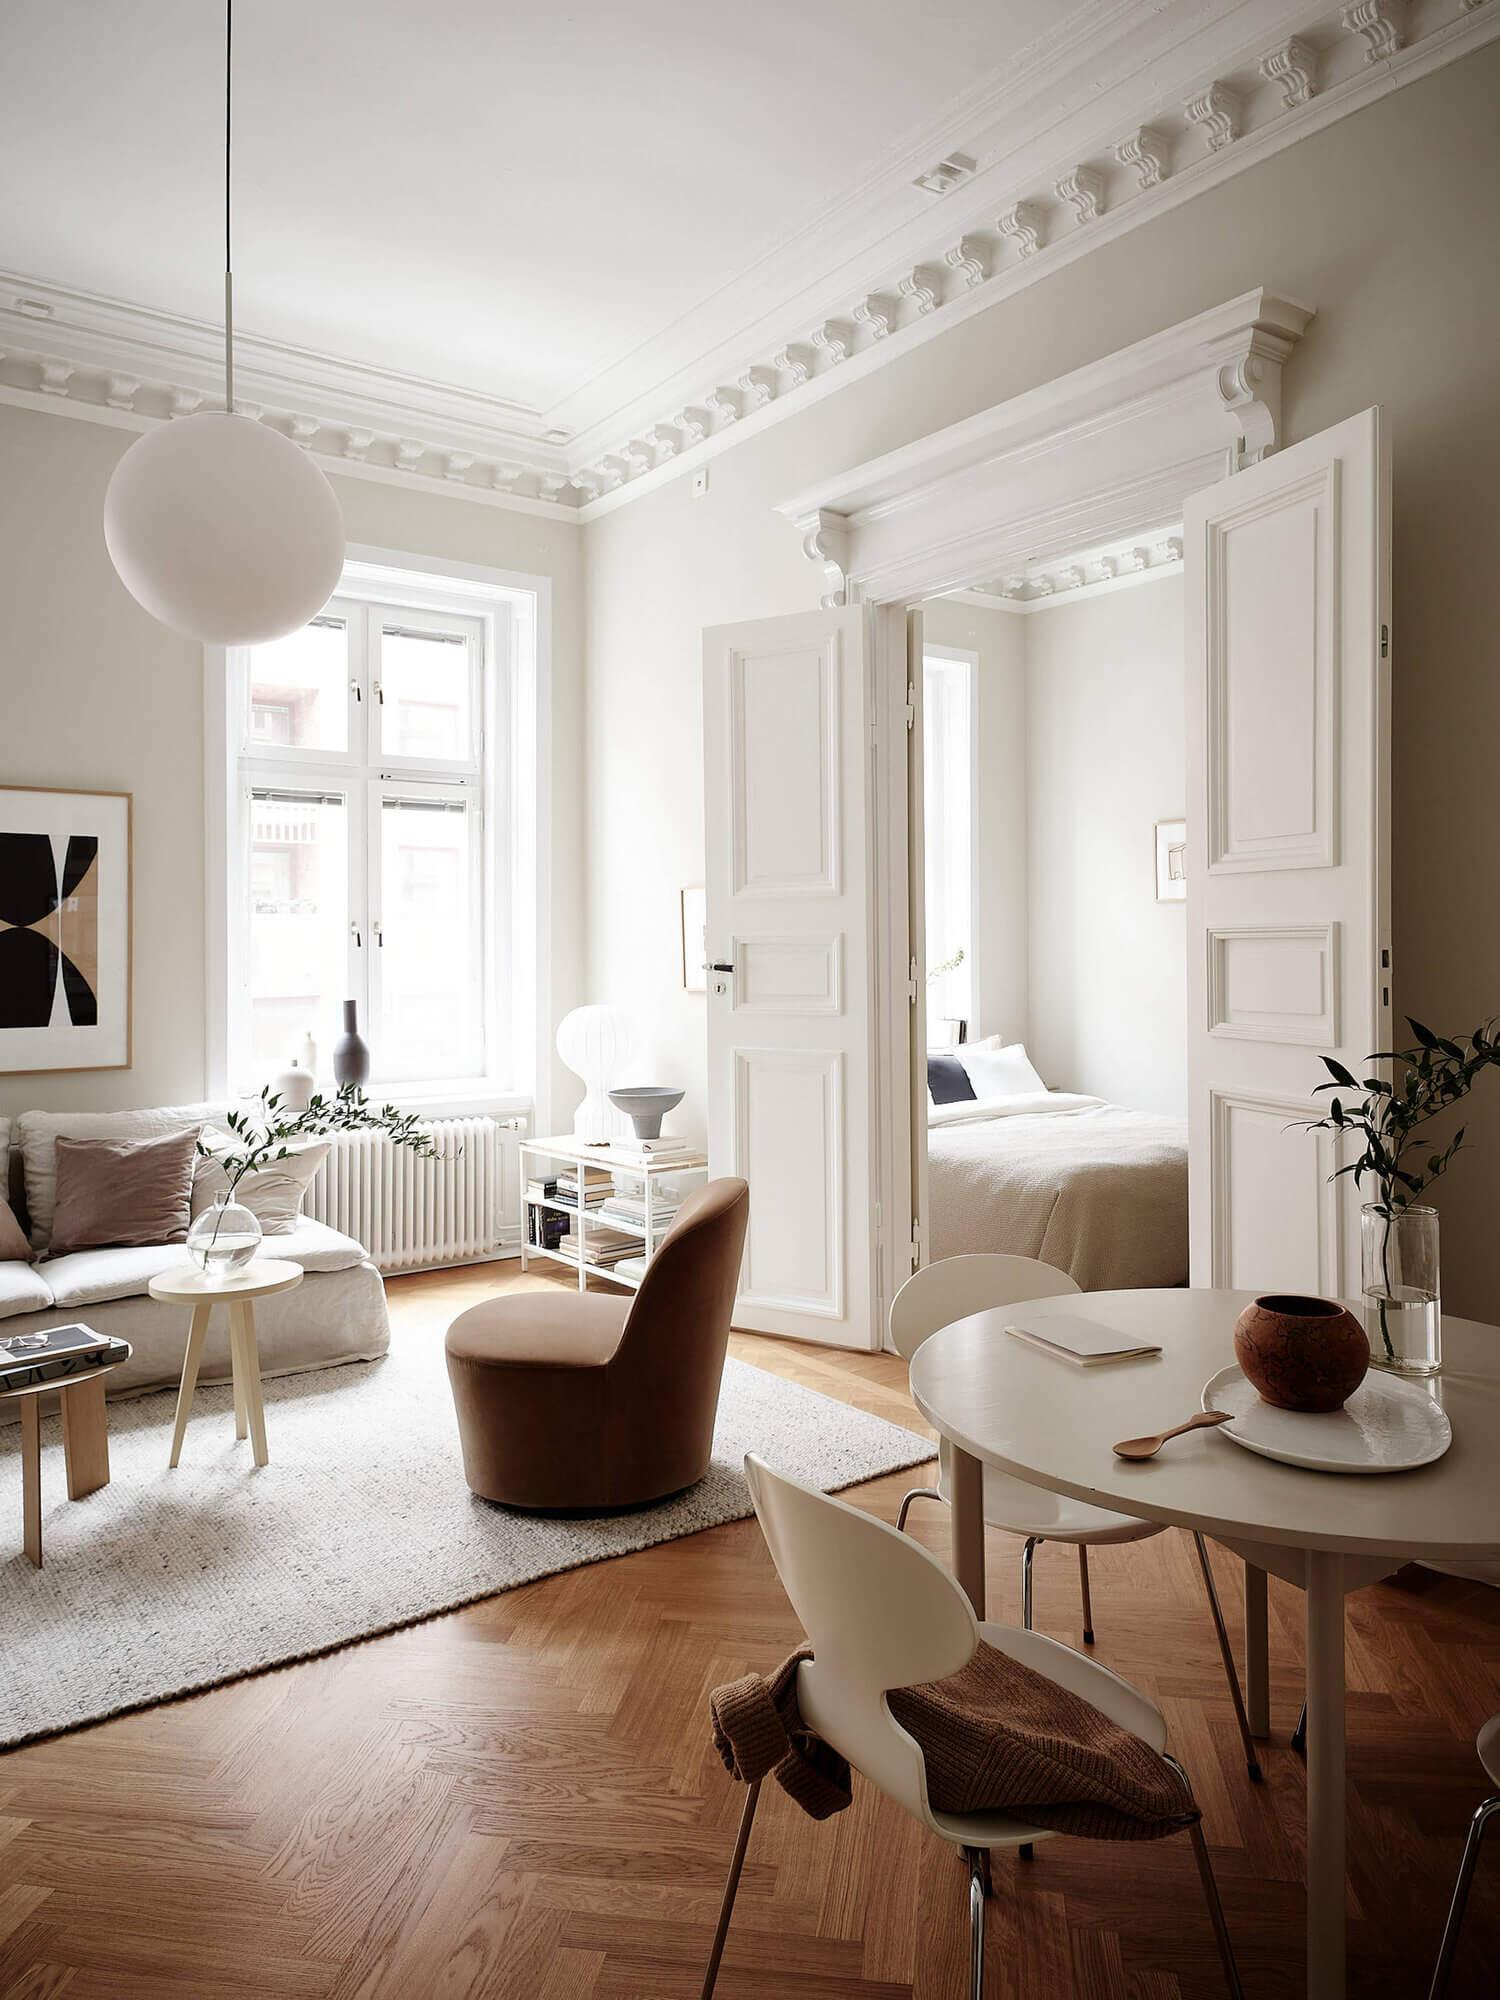 A Serene Beige Apartment with Original Details